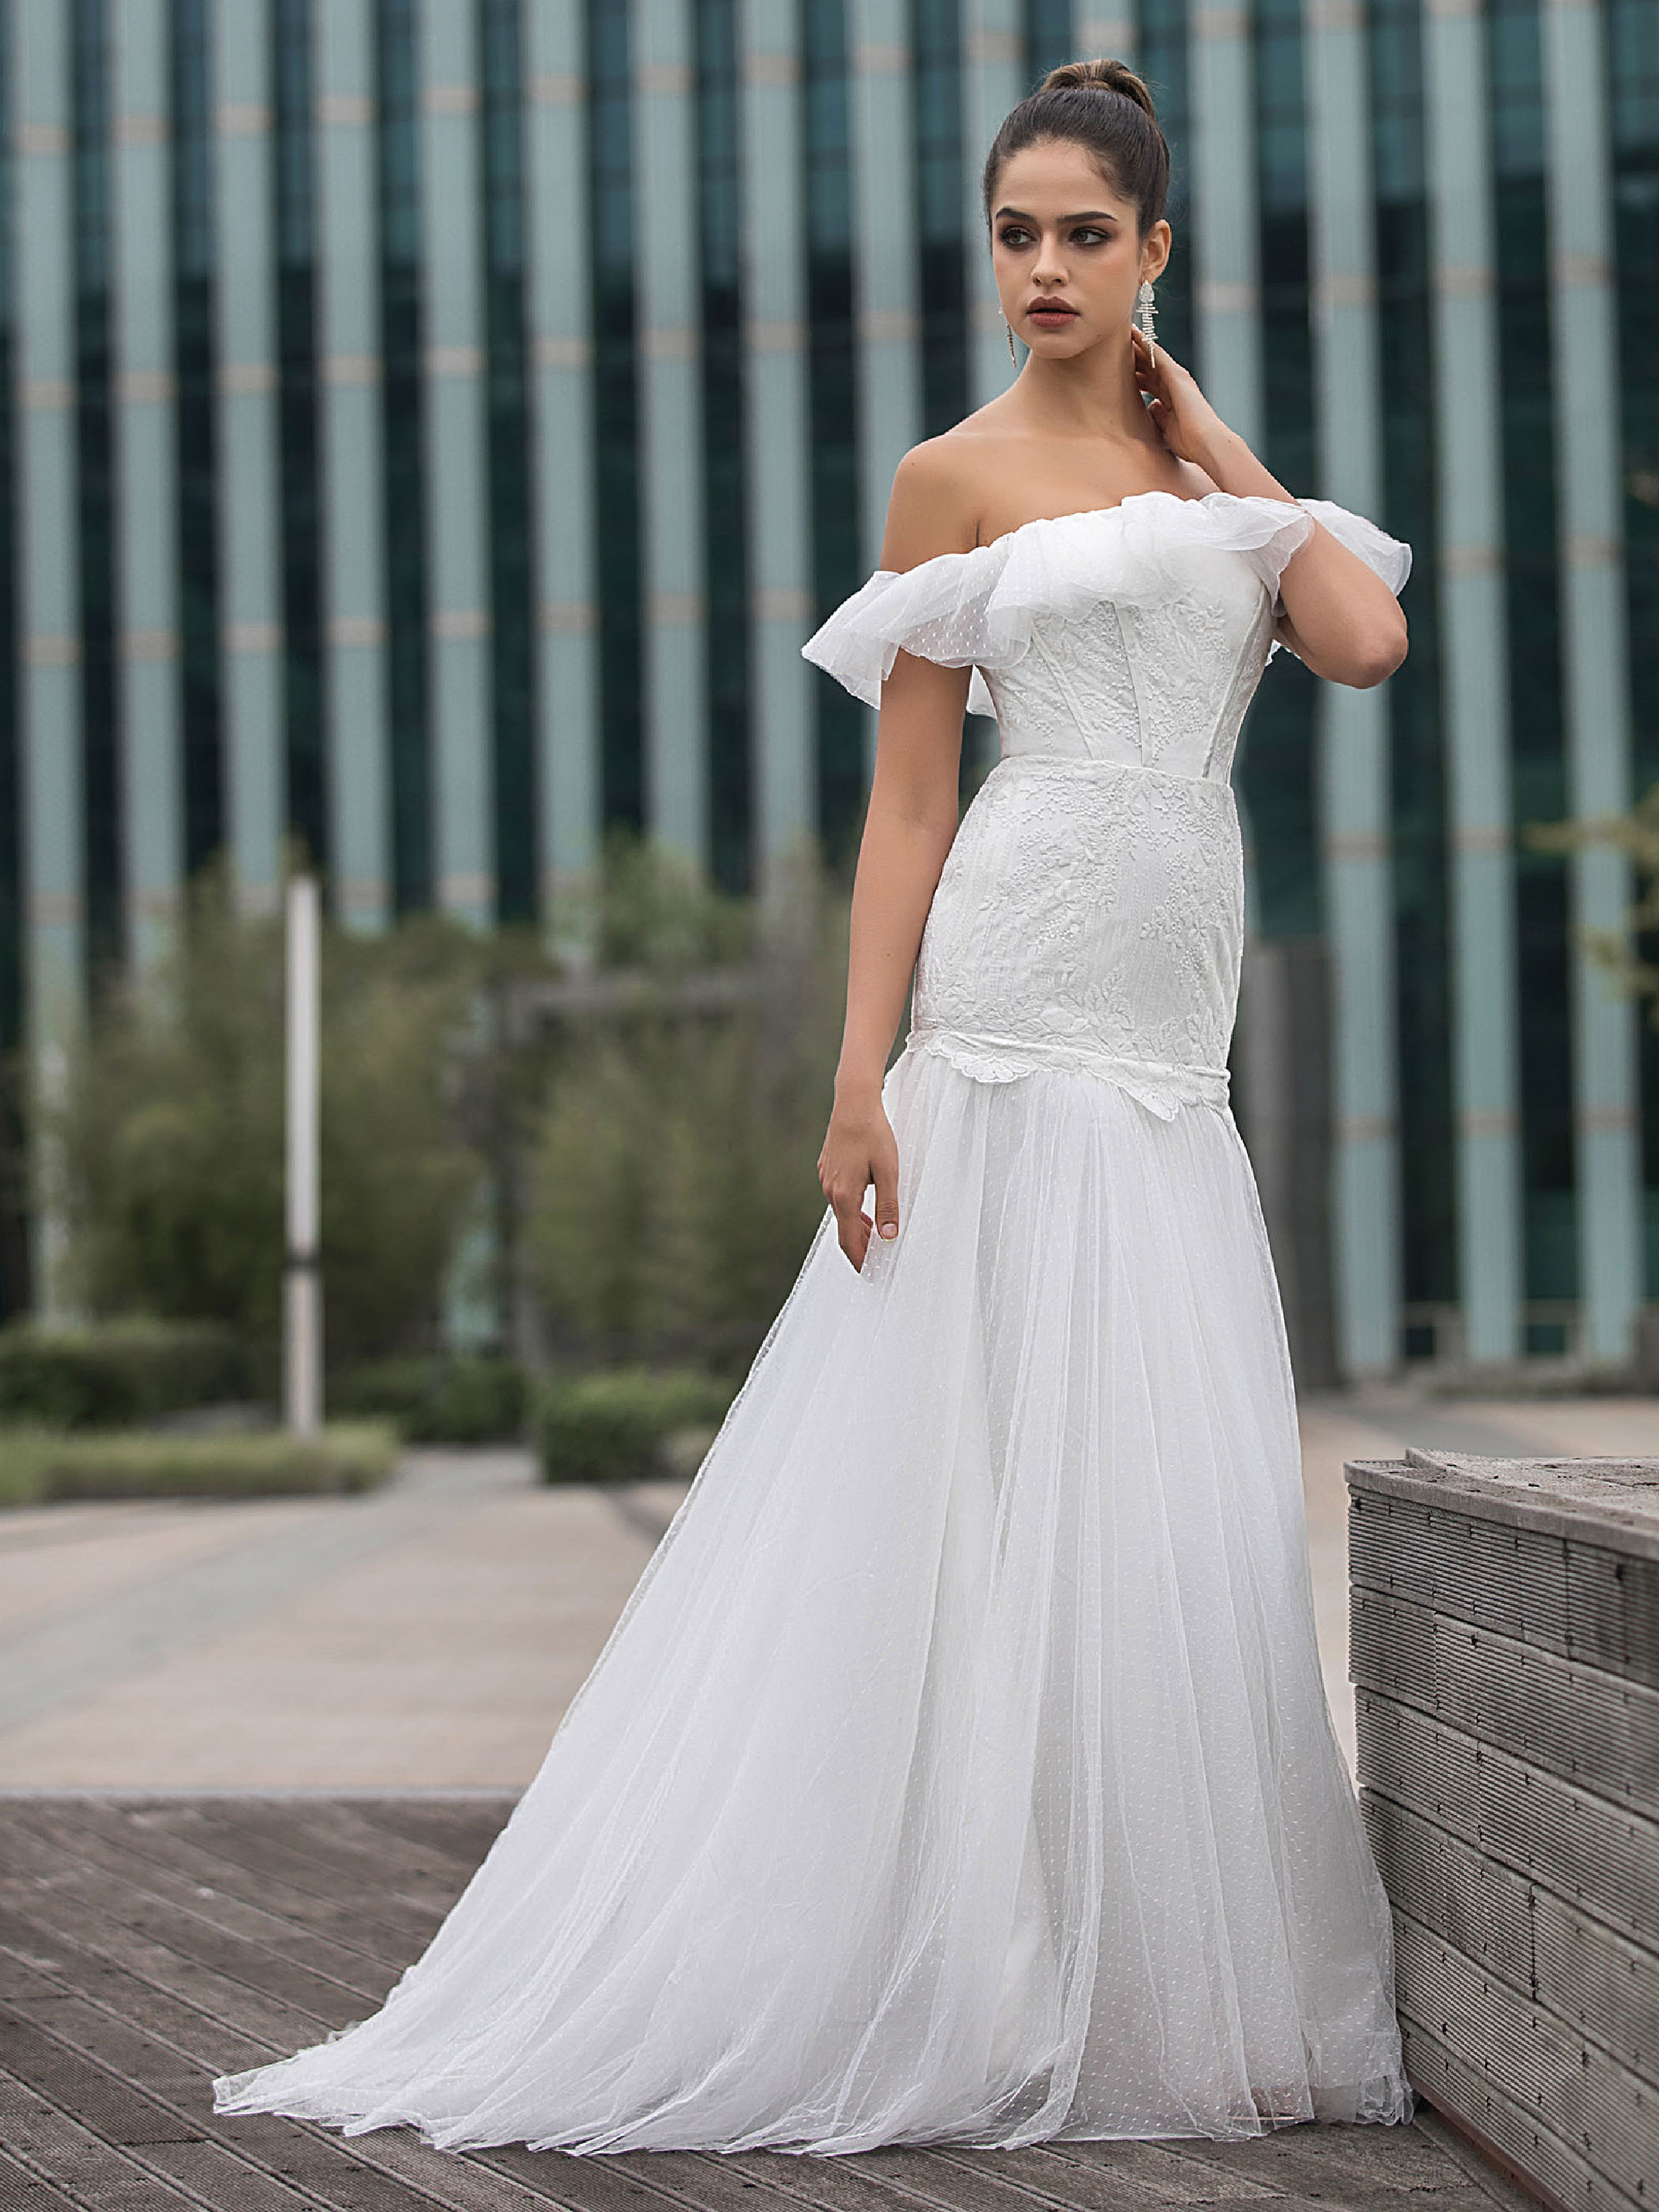 White Ivory Lace Bridal Wedding Dresses Ruffle Sweep Train Gown Custom size